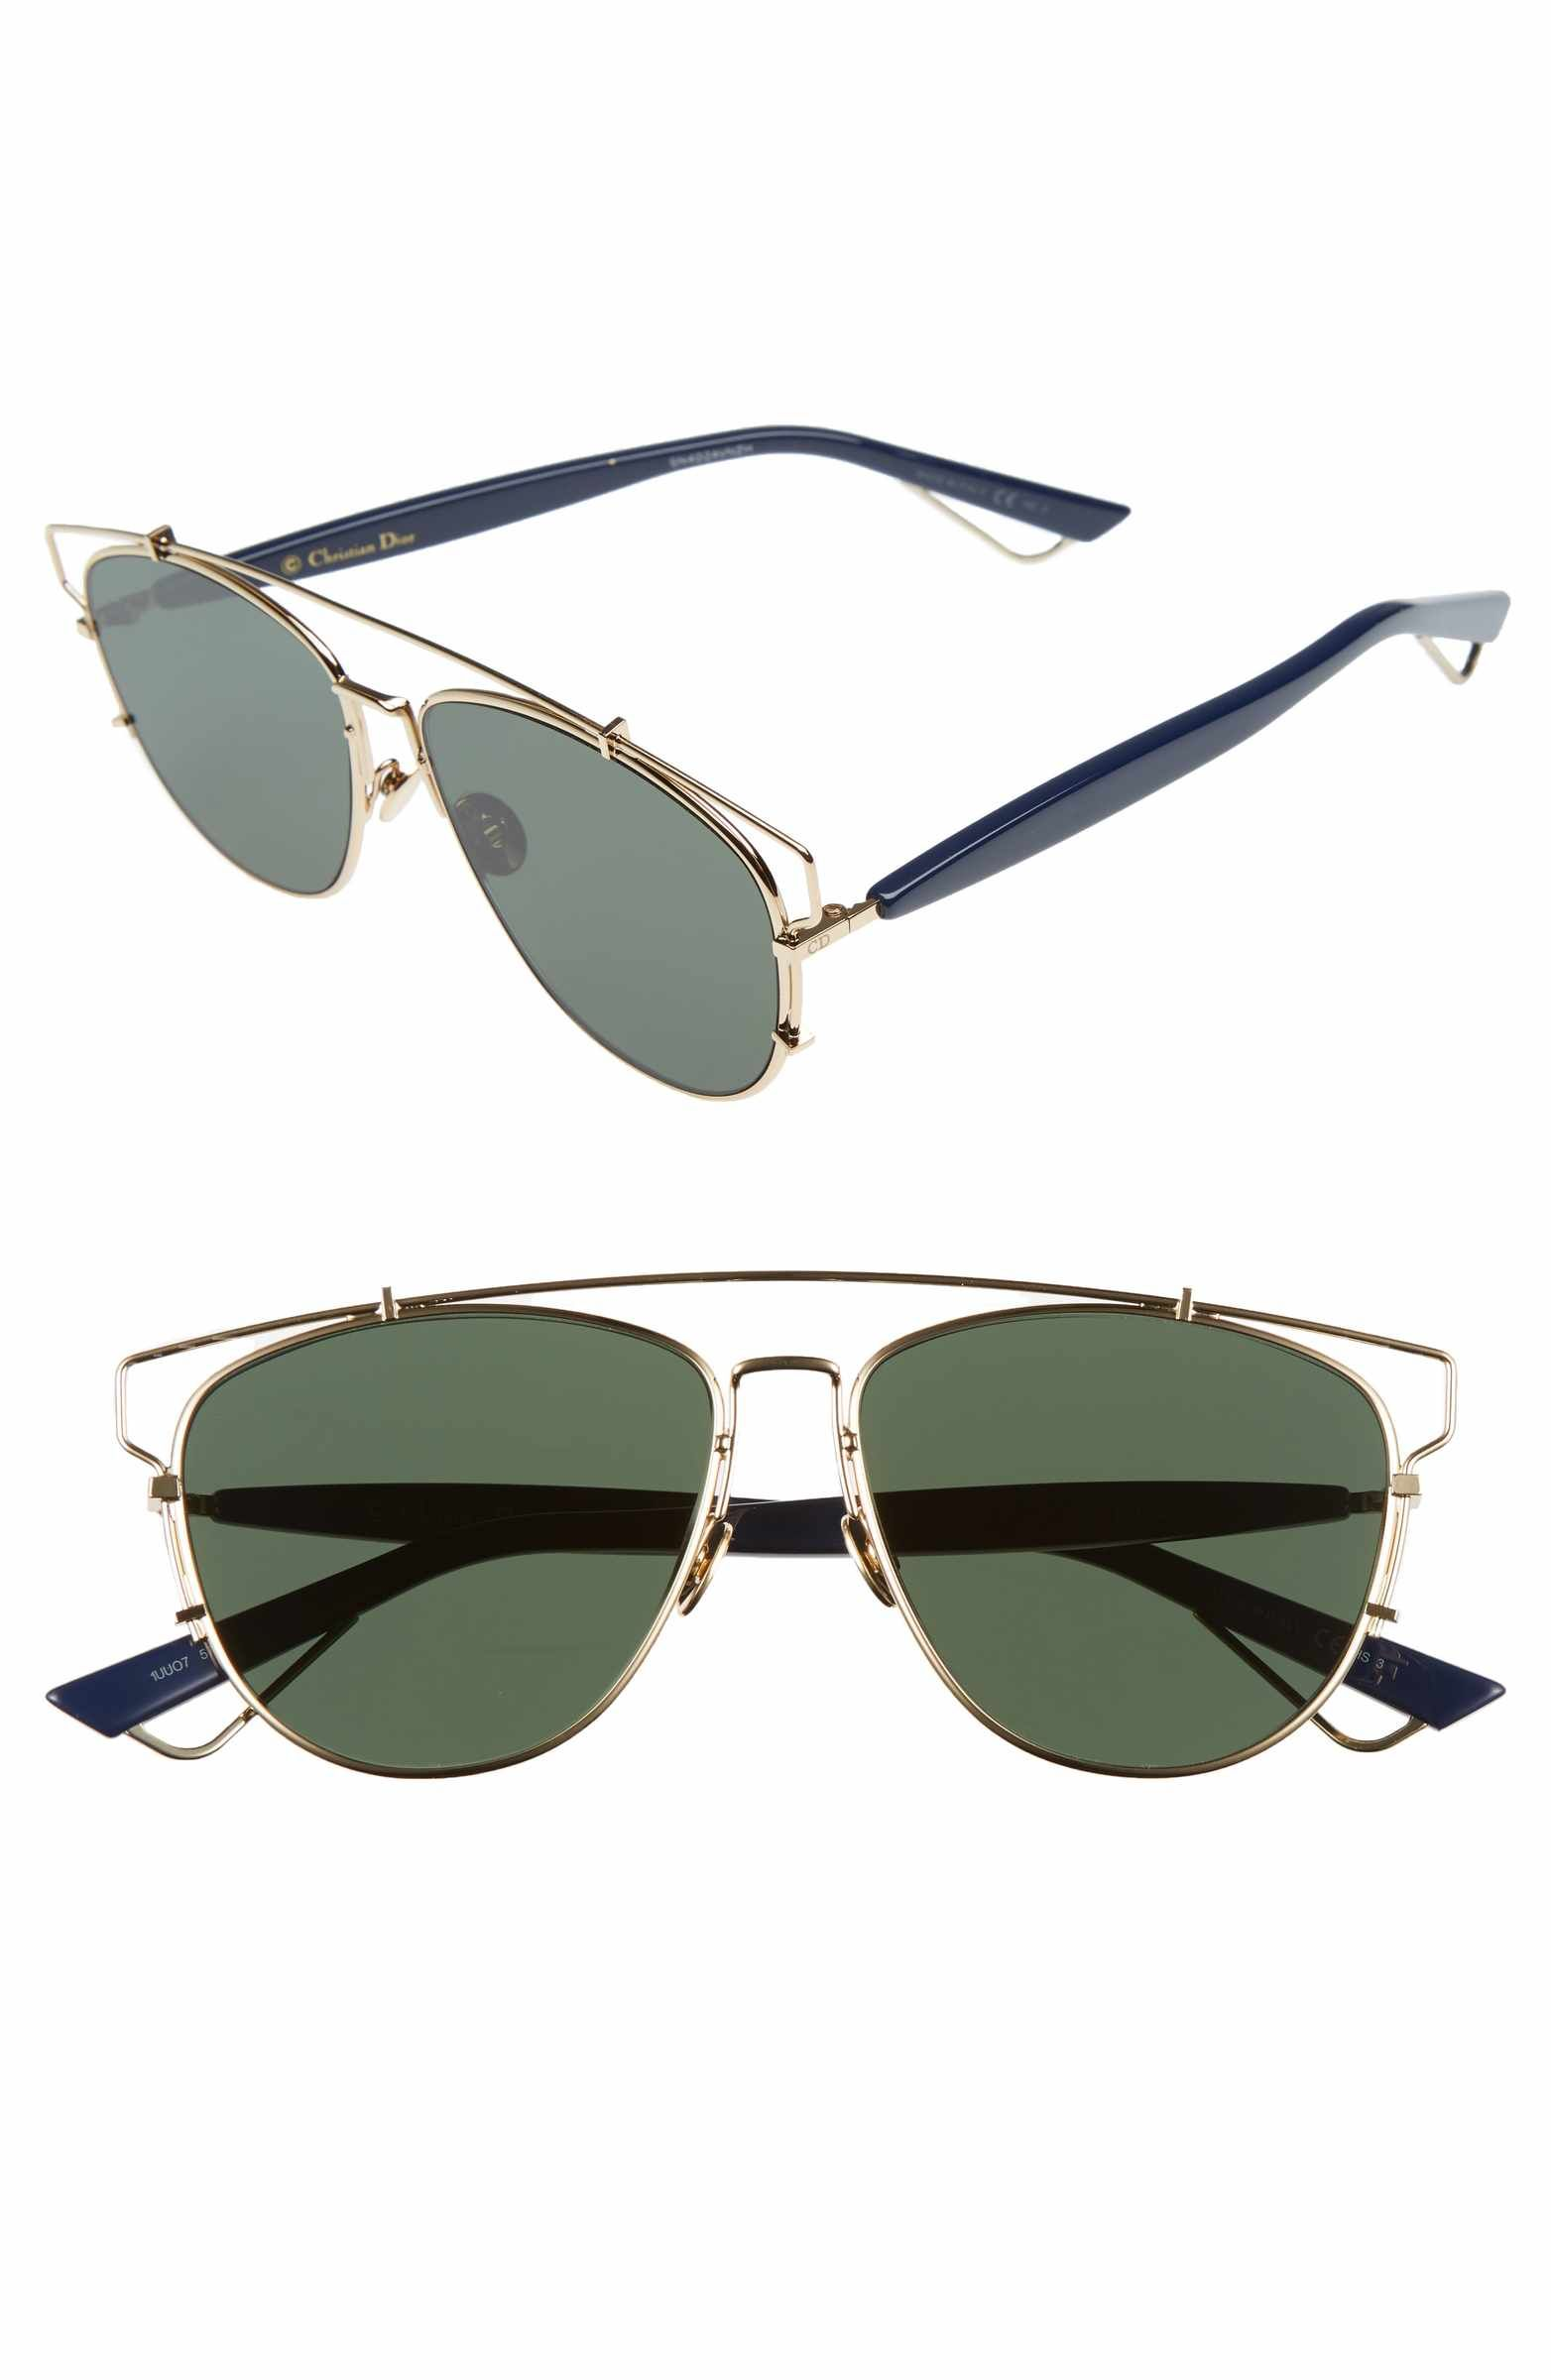 67a34c50b6 Main Image - Dior Technologic 57mm Brow Bar Sunglasses